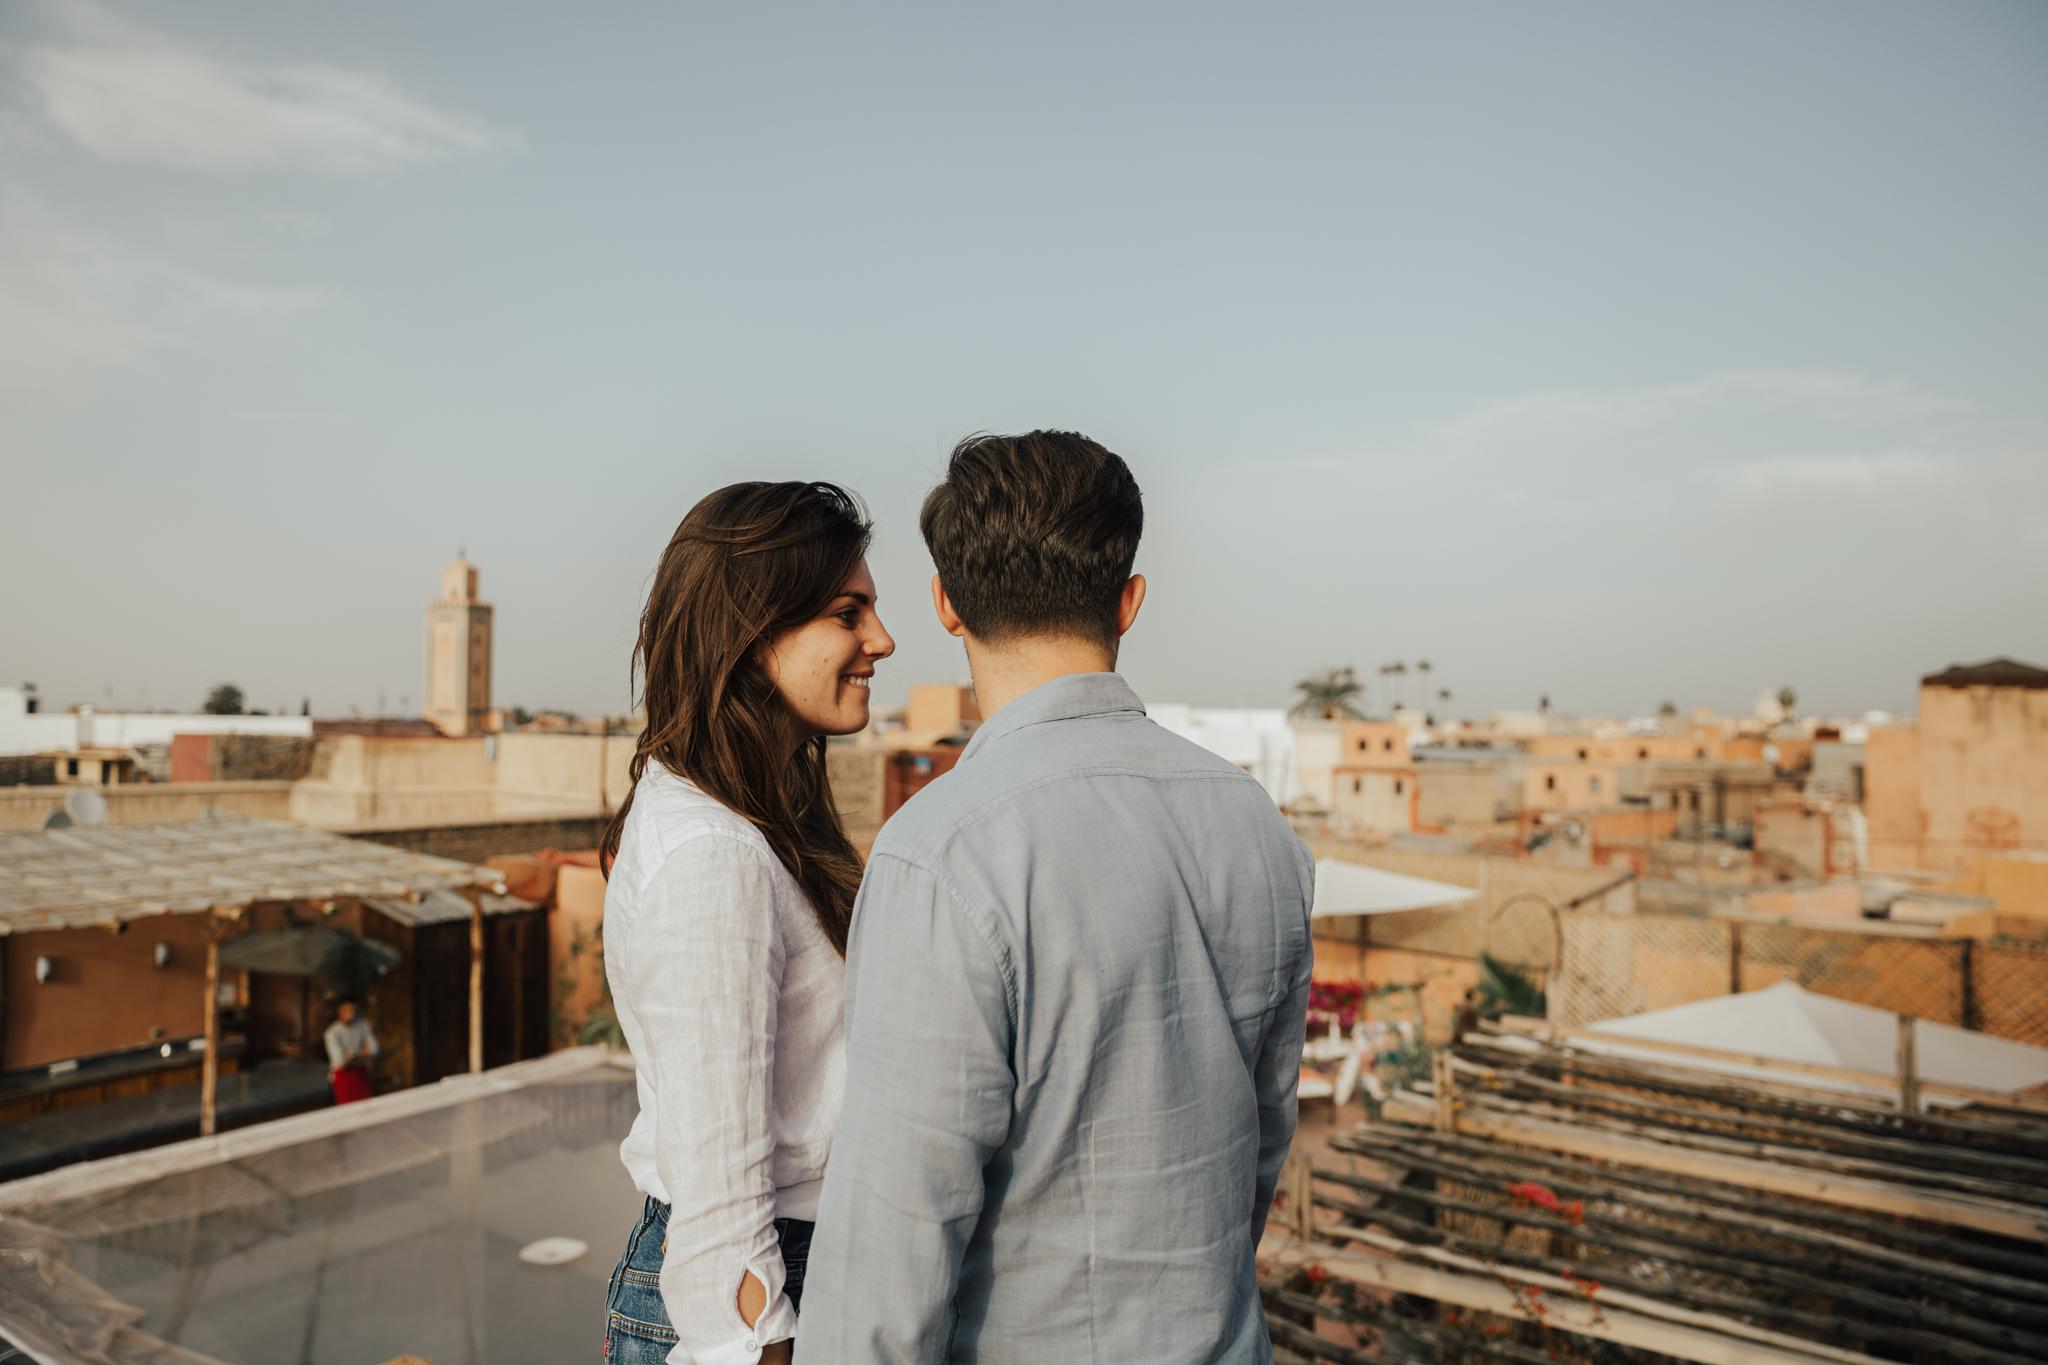 marrekech morocco rooftop